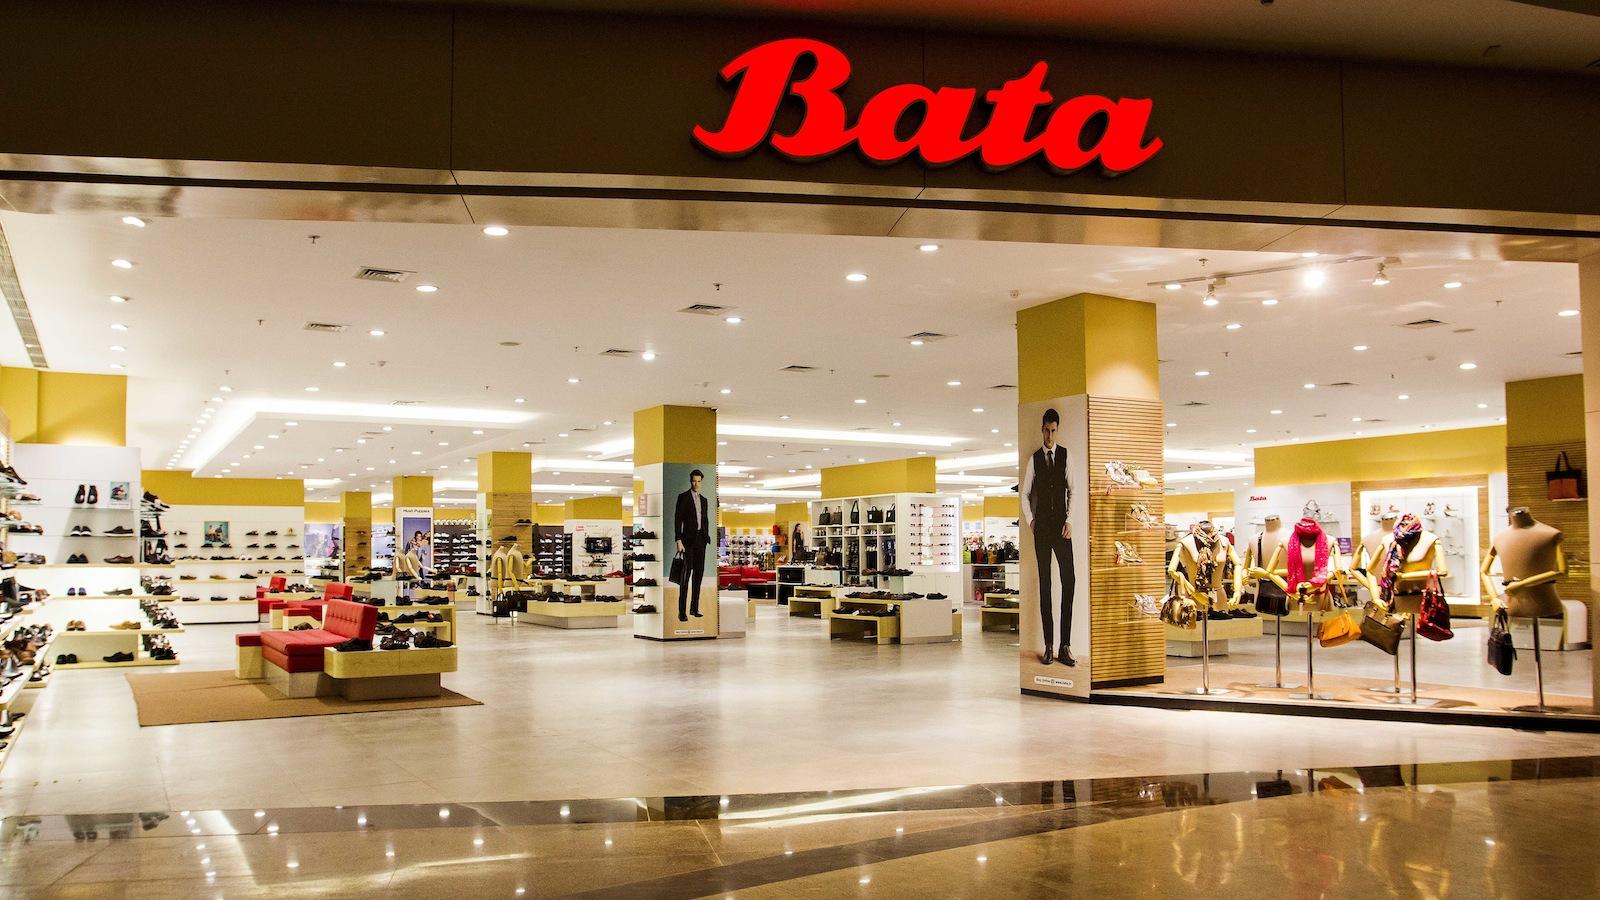 A Bata store in a mall.